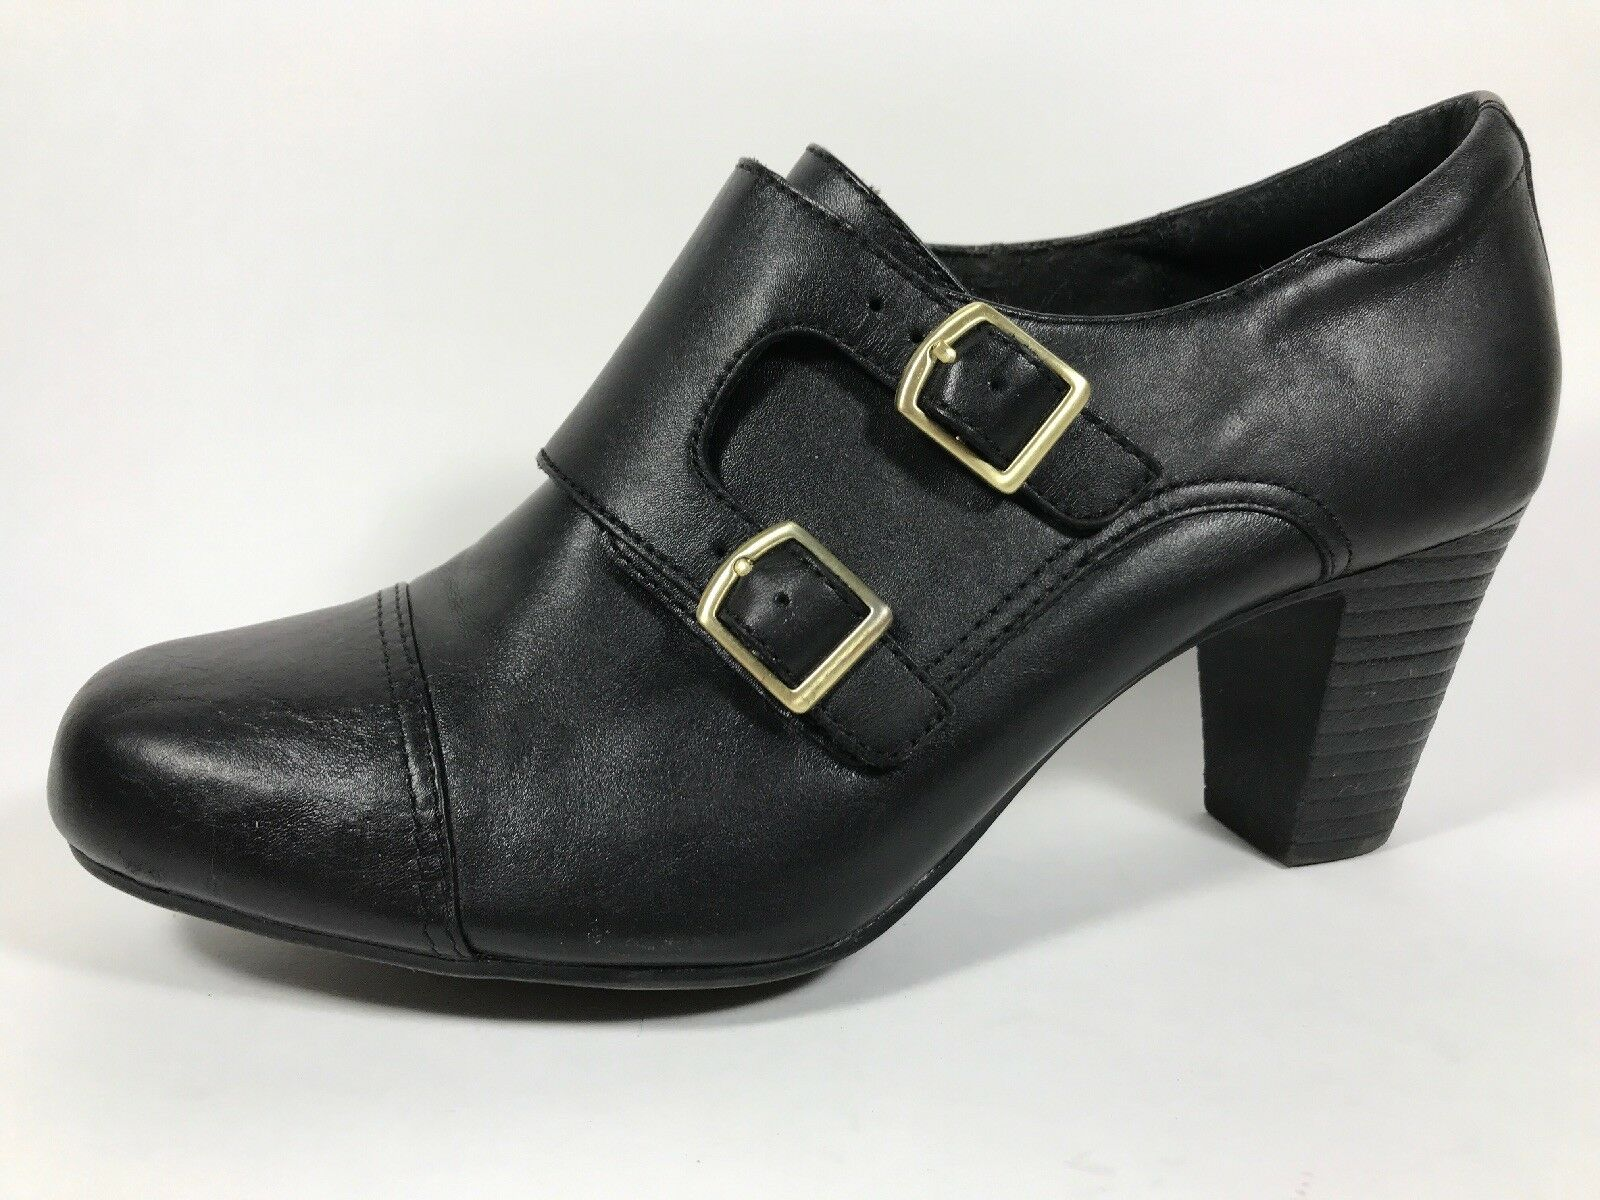 3b6f24e62d41 Clarks Black Bendables Black Leather 27800 Ankle Boots Womens Sz Leather 9  M 526cfe1